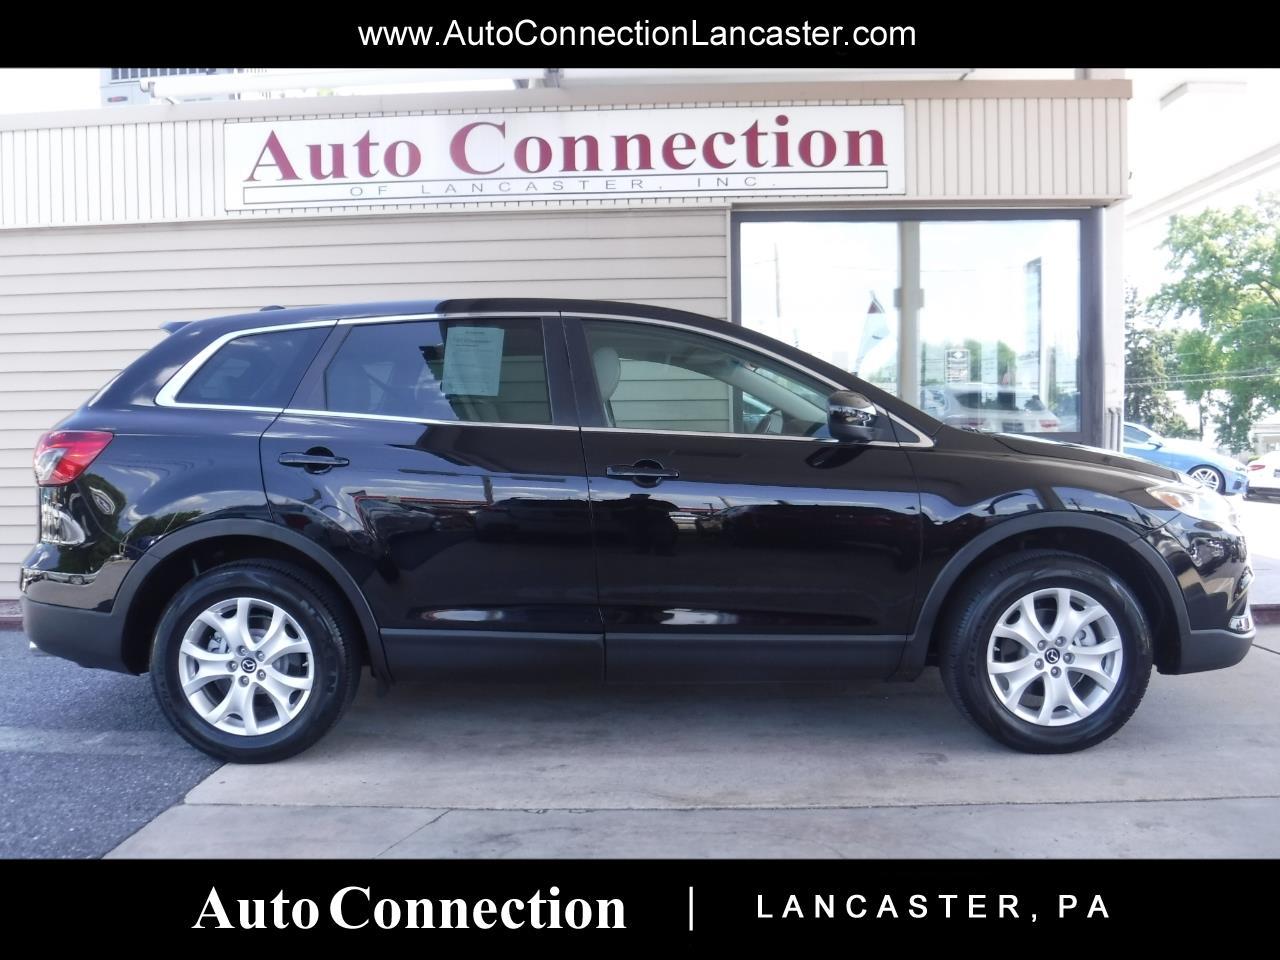 Mazda Lancaster Pa >> Used 2013 Mazda Cx 9 Awd 4dr Touring For Sale In Lancaster